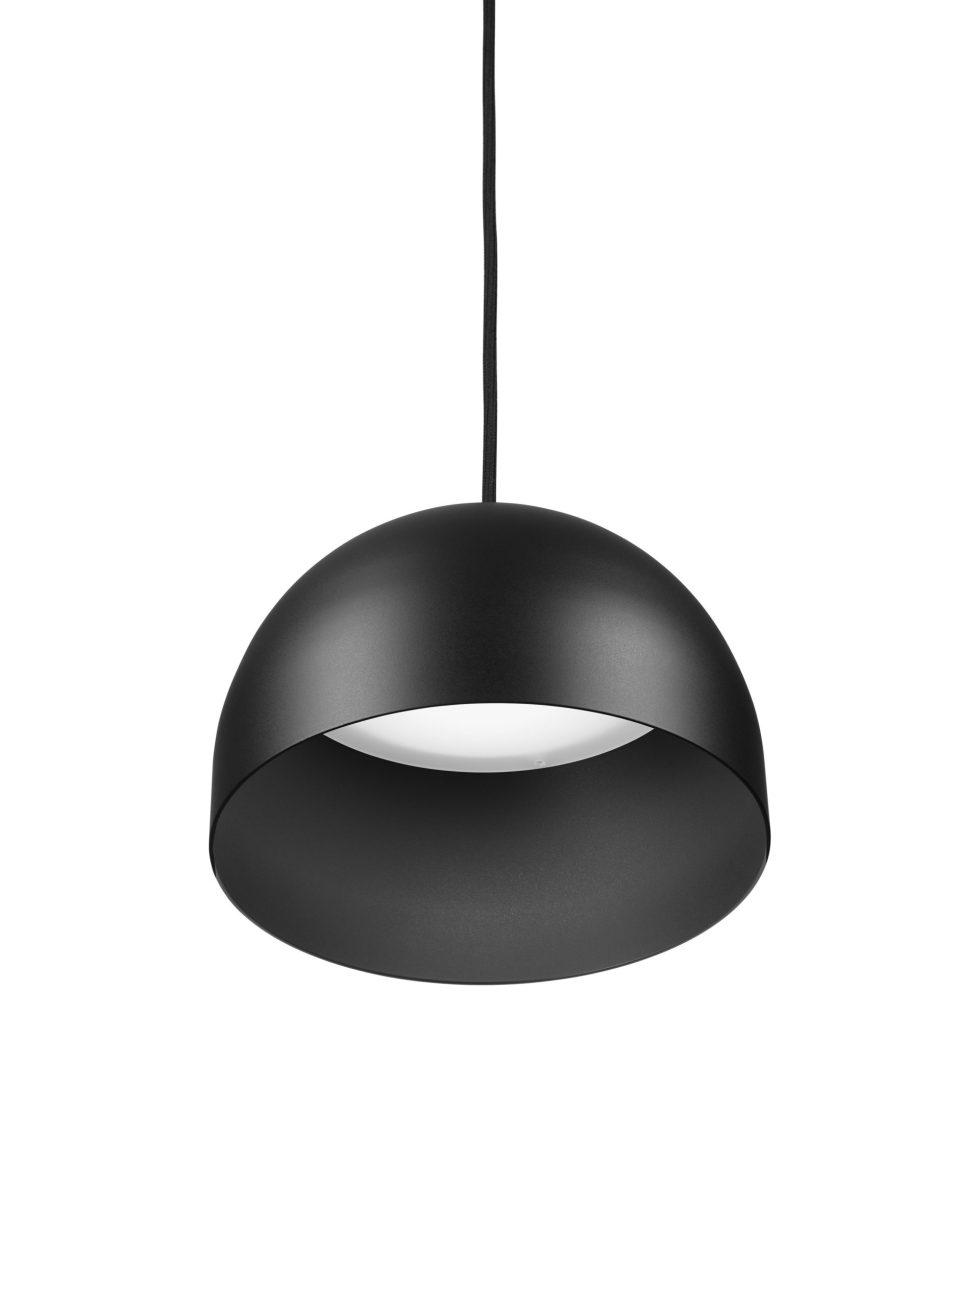 Bob Pendant zerolighting black on white background